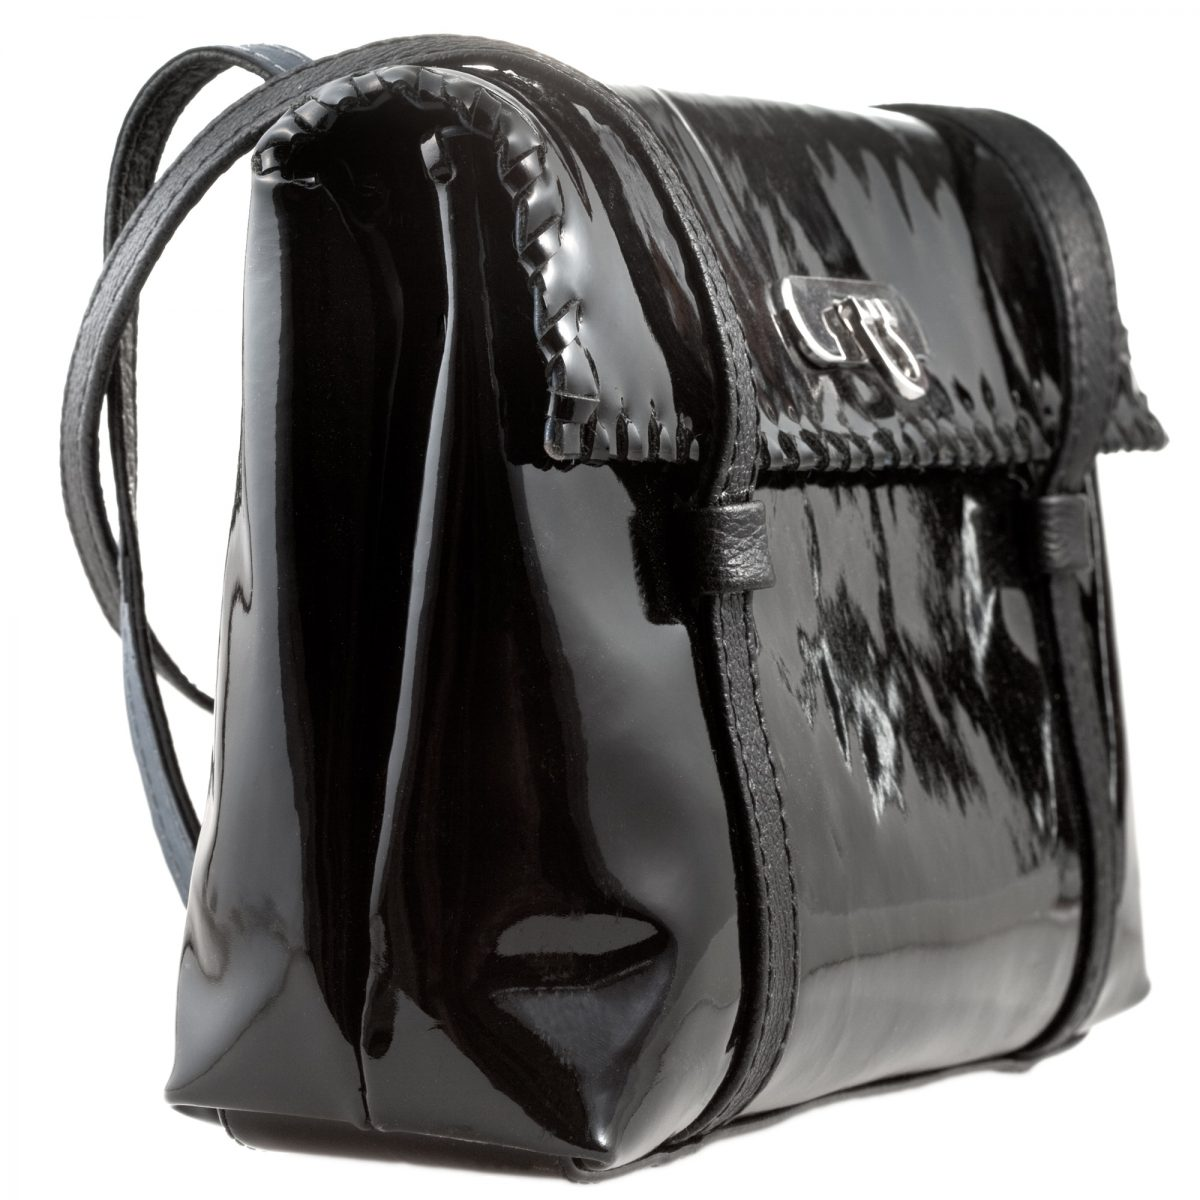 black patent leather lady's bag